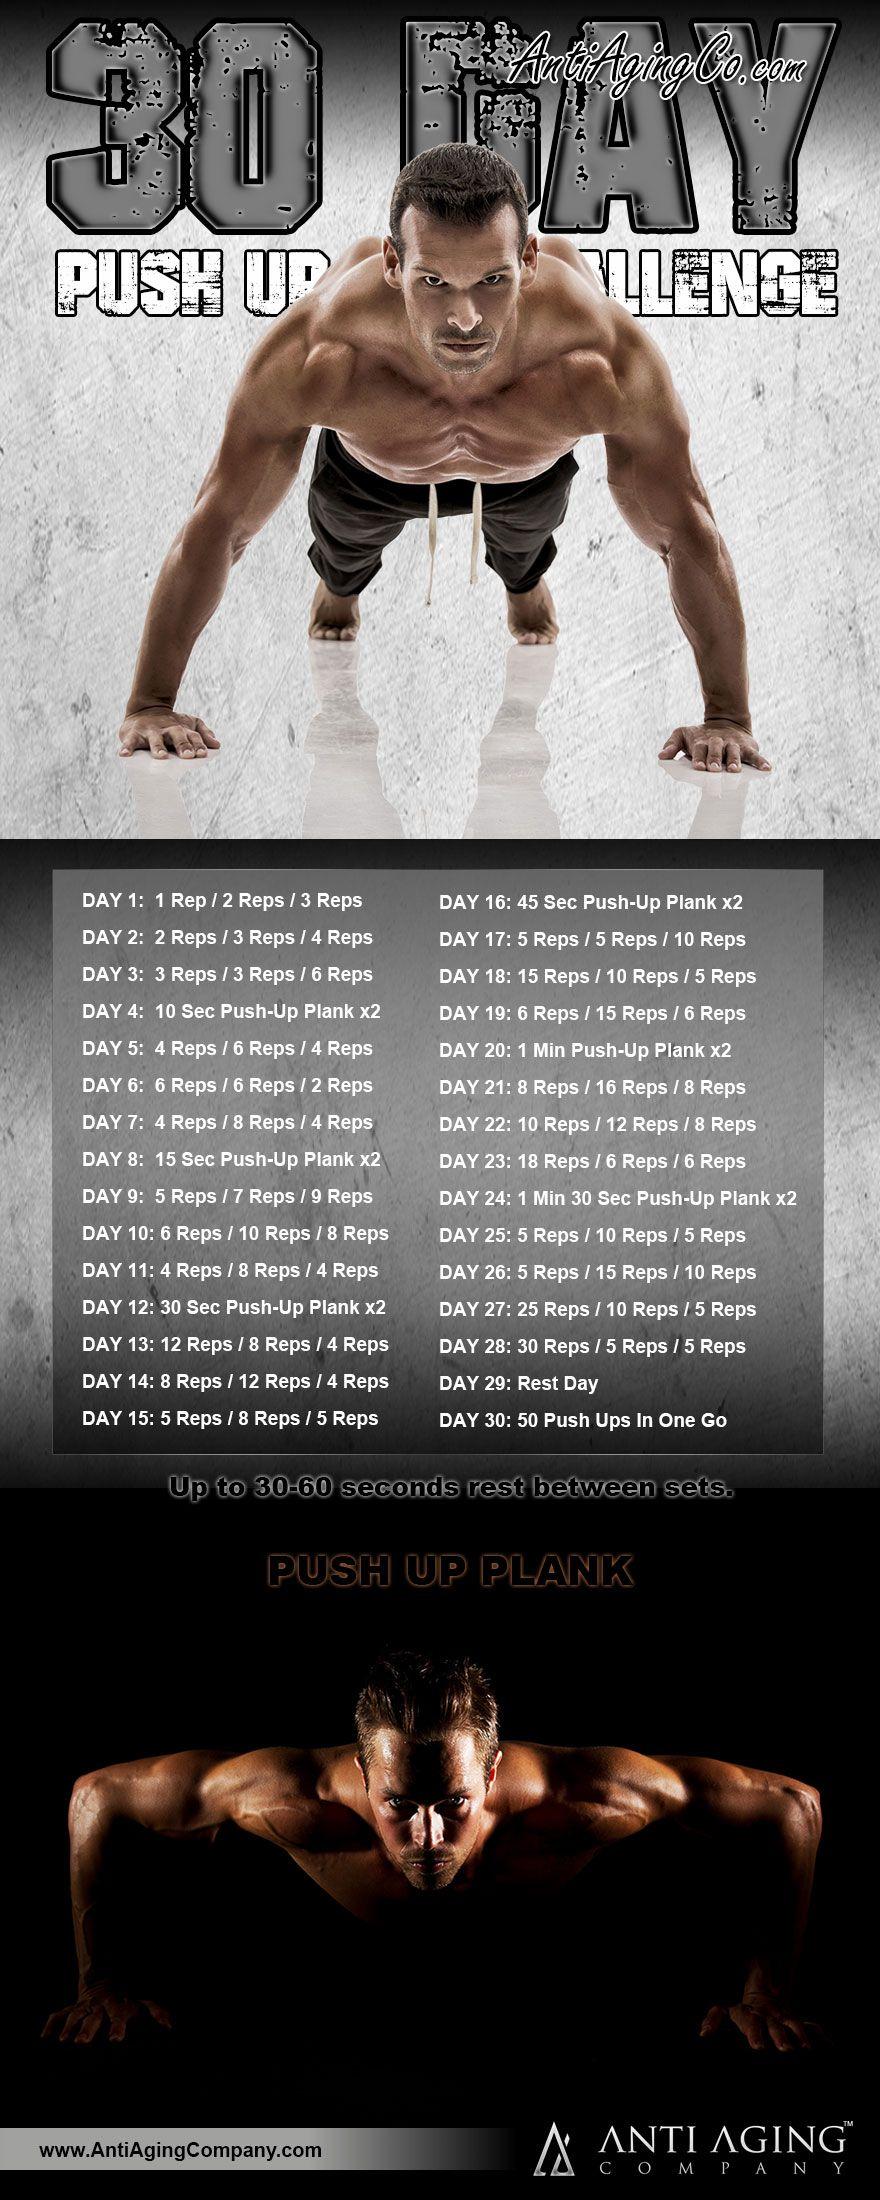 30 day push up challenge fitness challenge pinterest poids de musculation exercices et. Black Bedroom Furniture Sets. Home Design Ideas